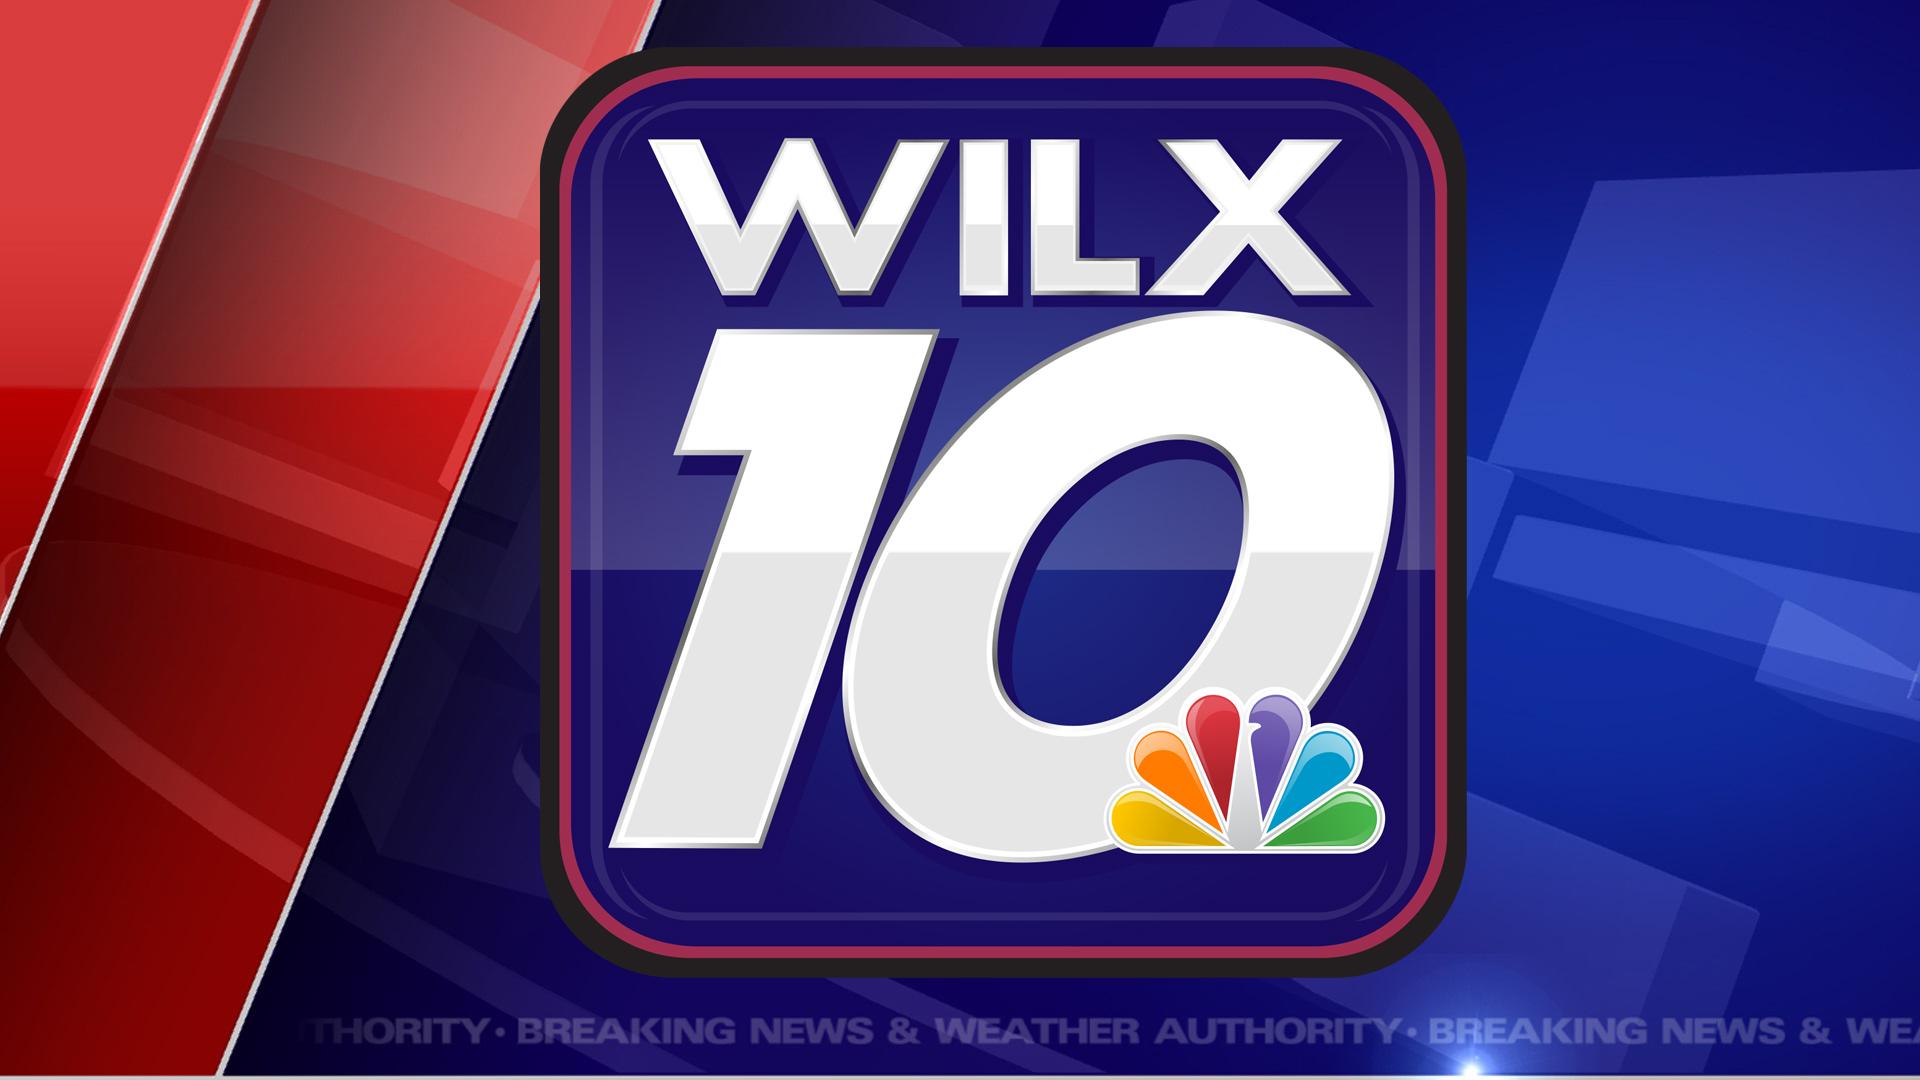 WILX newsroom local tv news review